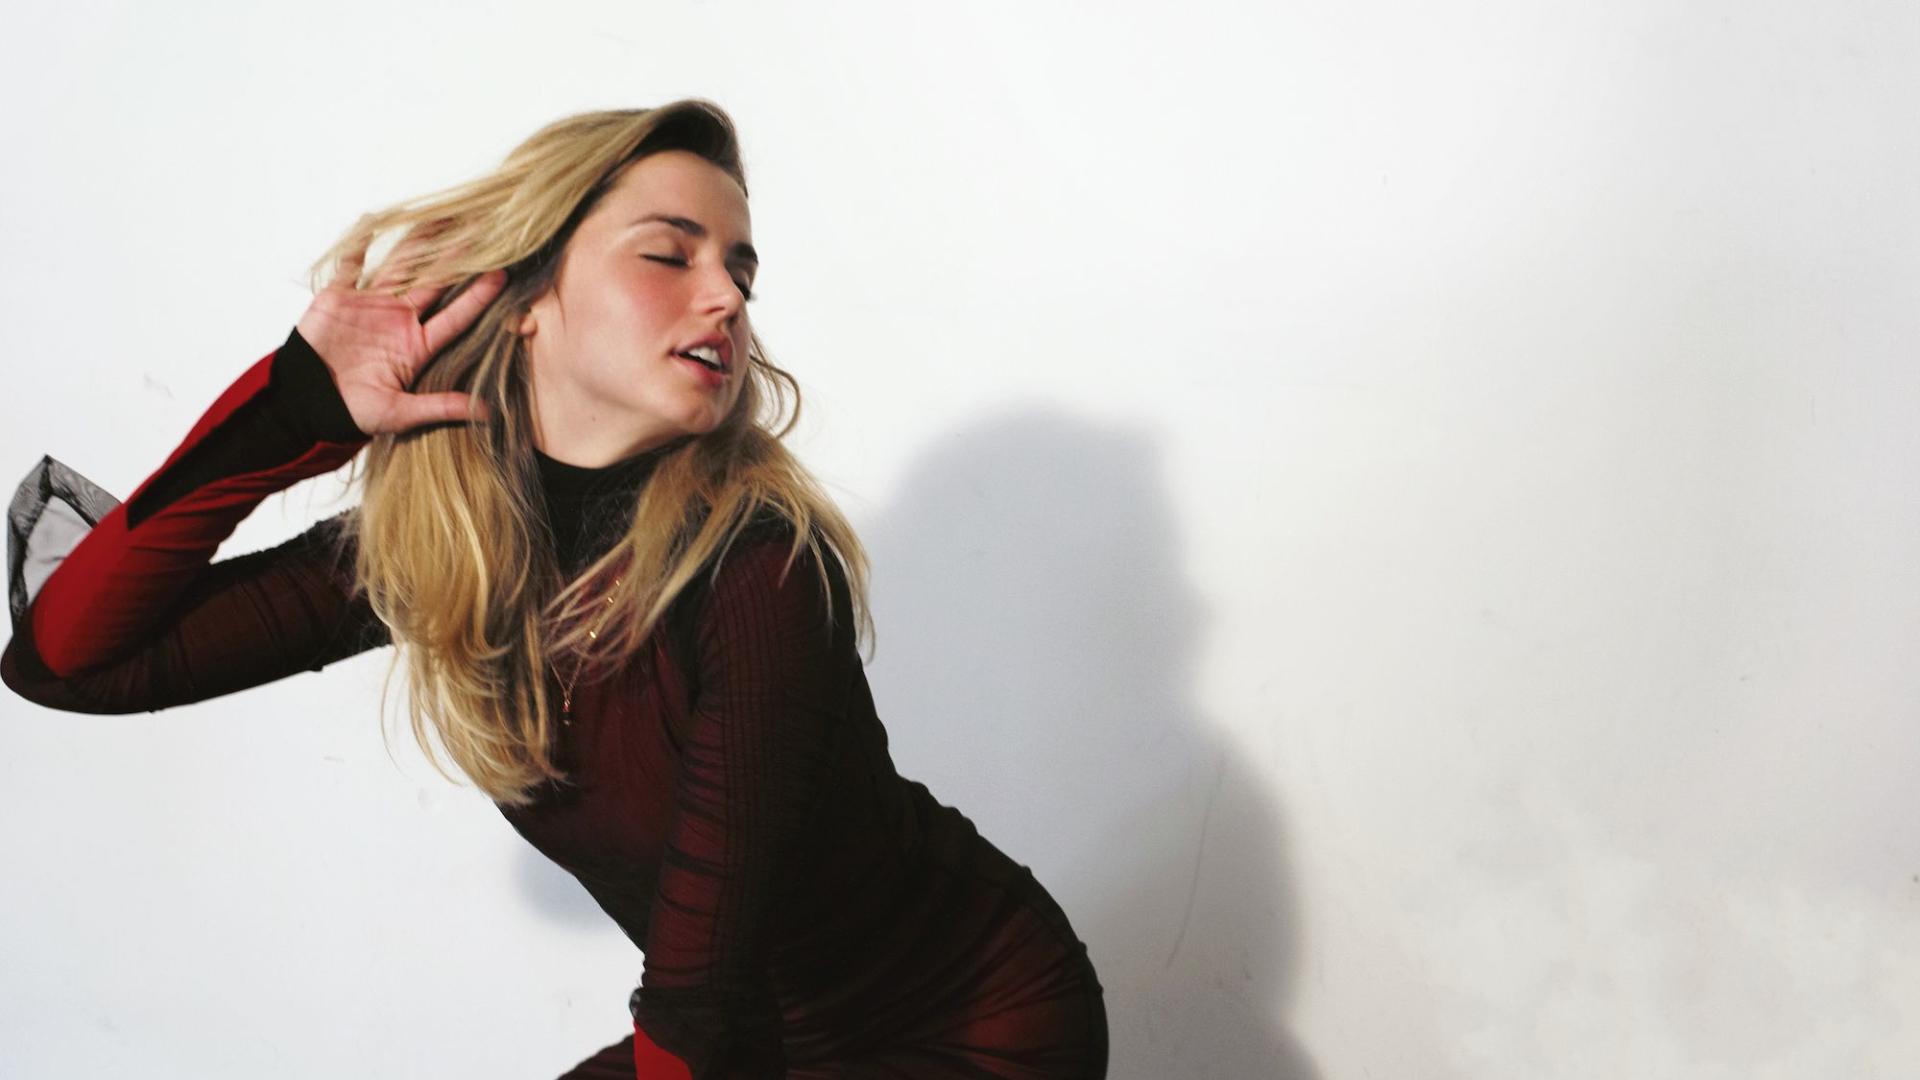 1920x1080 Sexy Ana De Armas In Red 1080p Laptop Full Hd Wallpaper